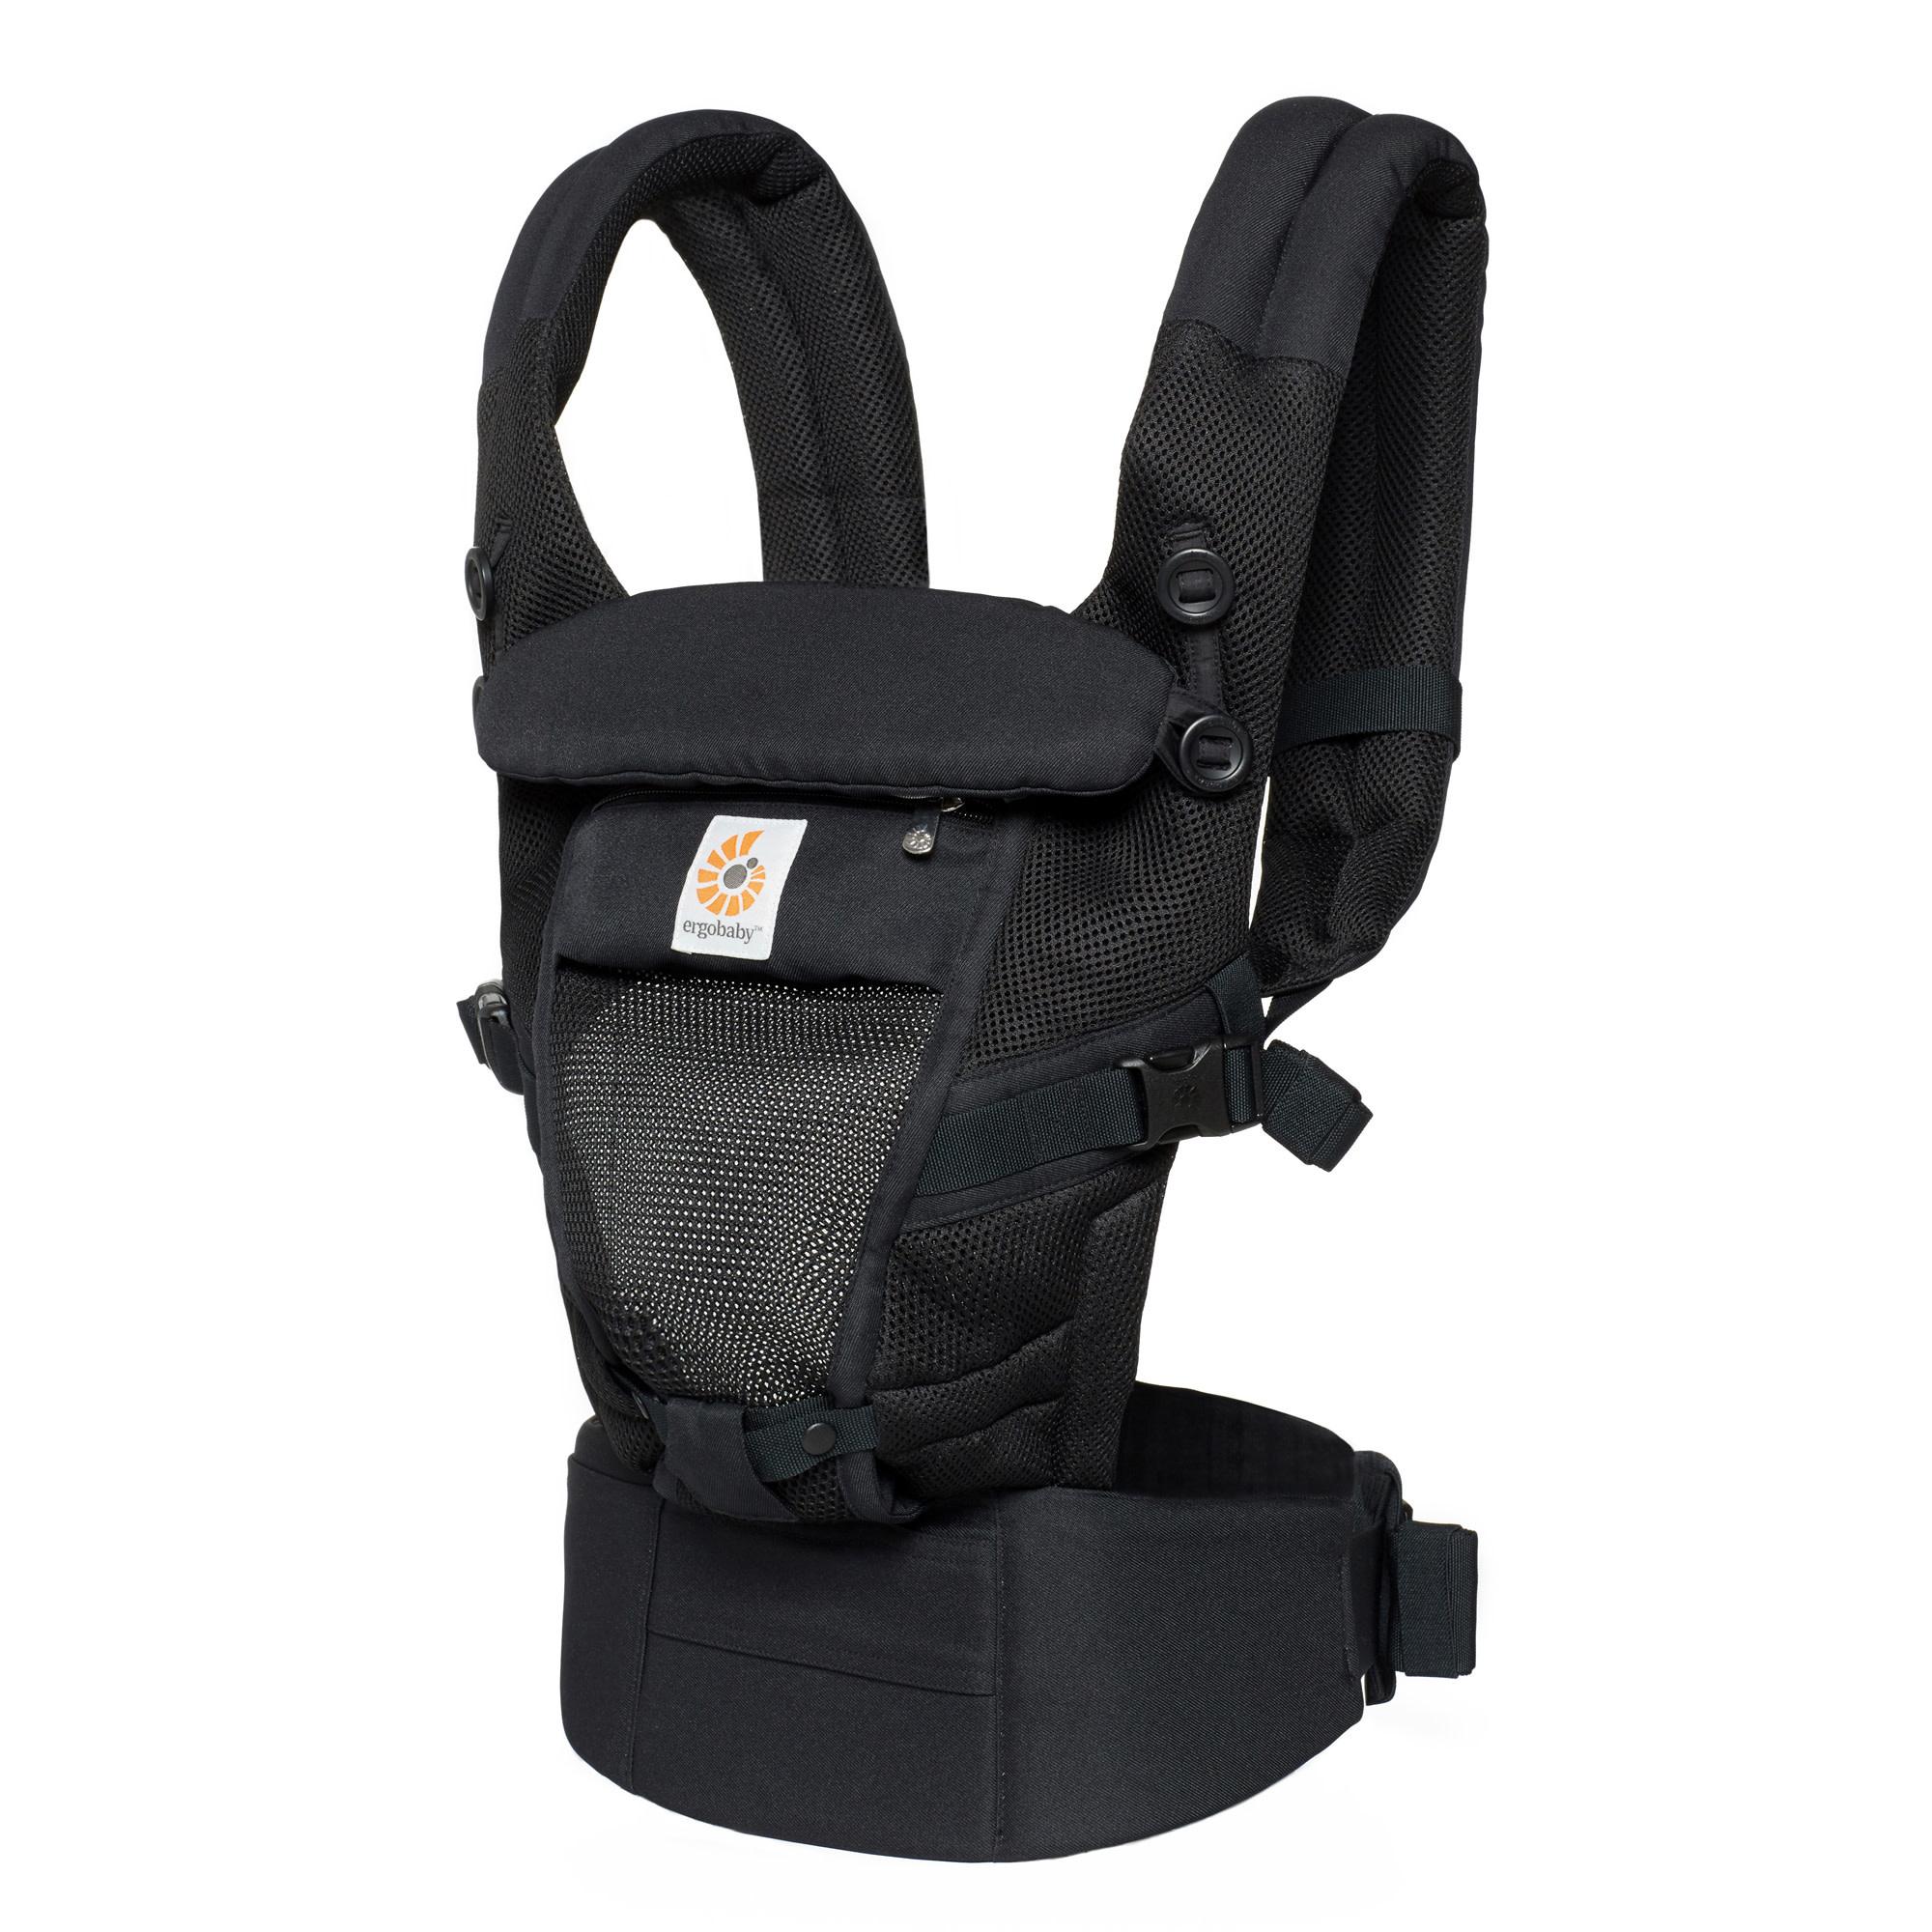 Babydraagzak Adapt Cool Air Mesh onyx black-1